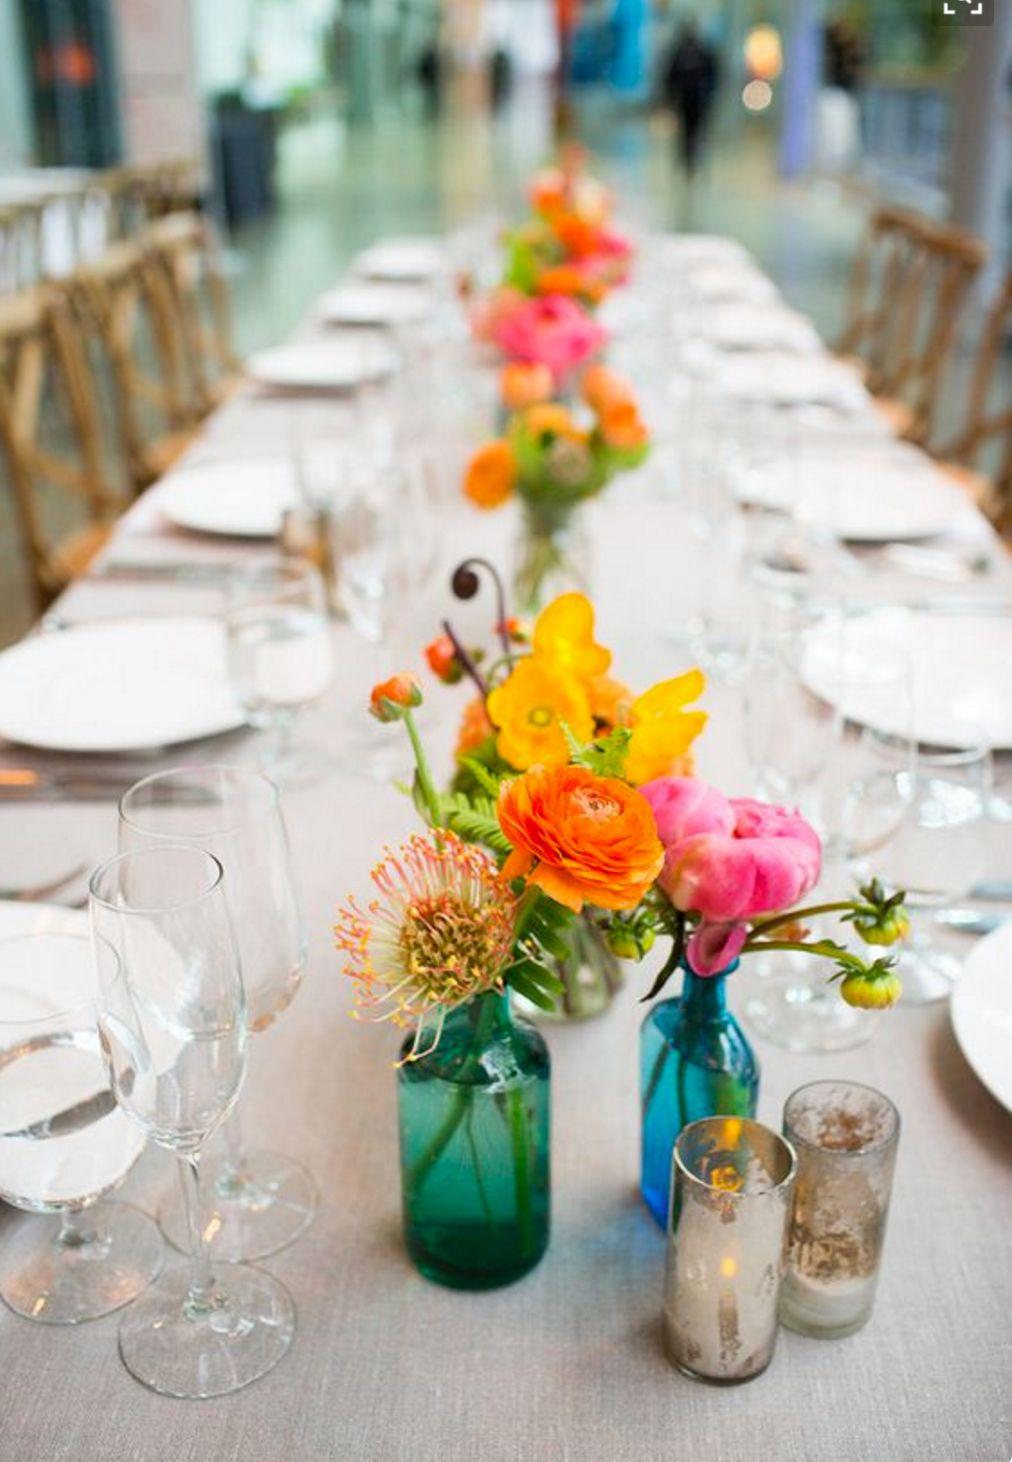 Fall wedding reception decor  Pin by Michaela Turley on TableReception Decorations  Pinterest